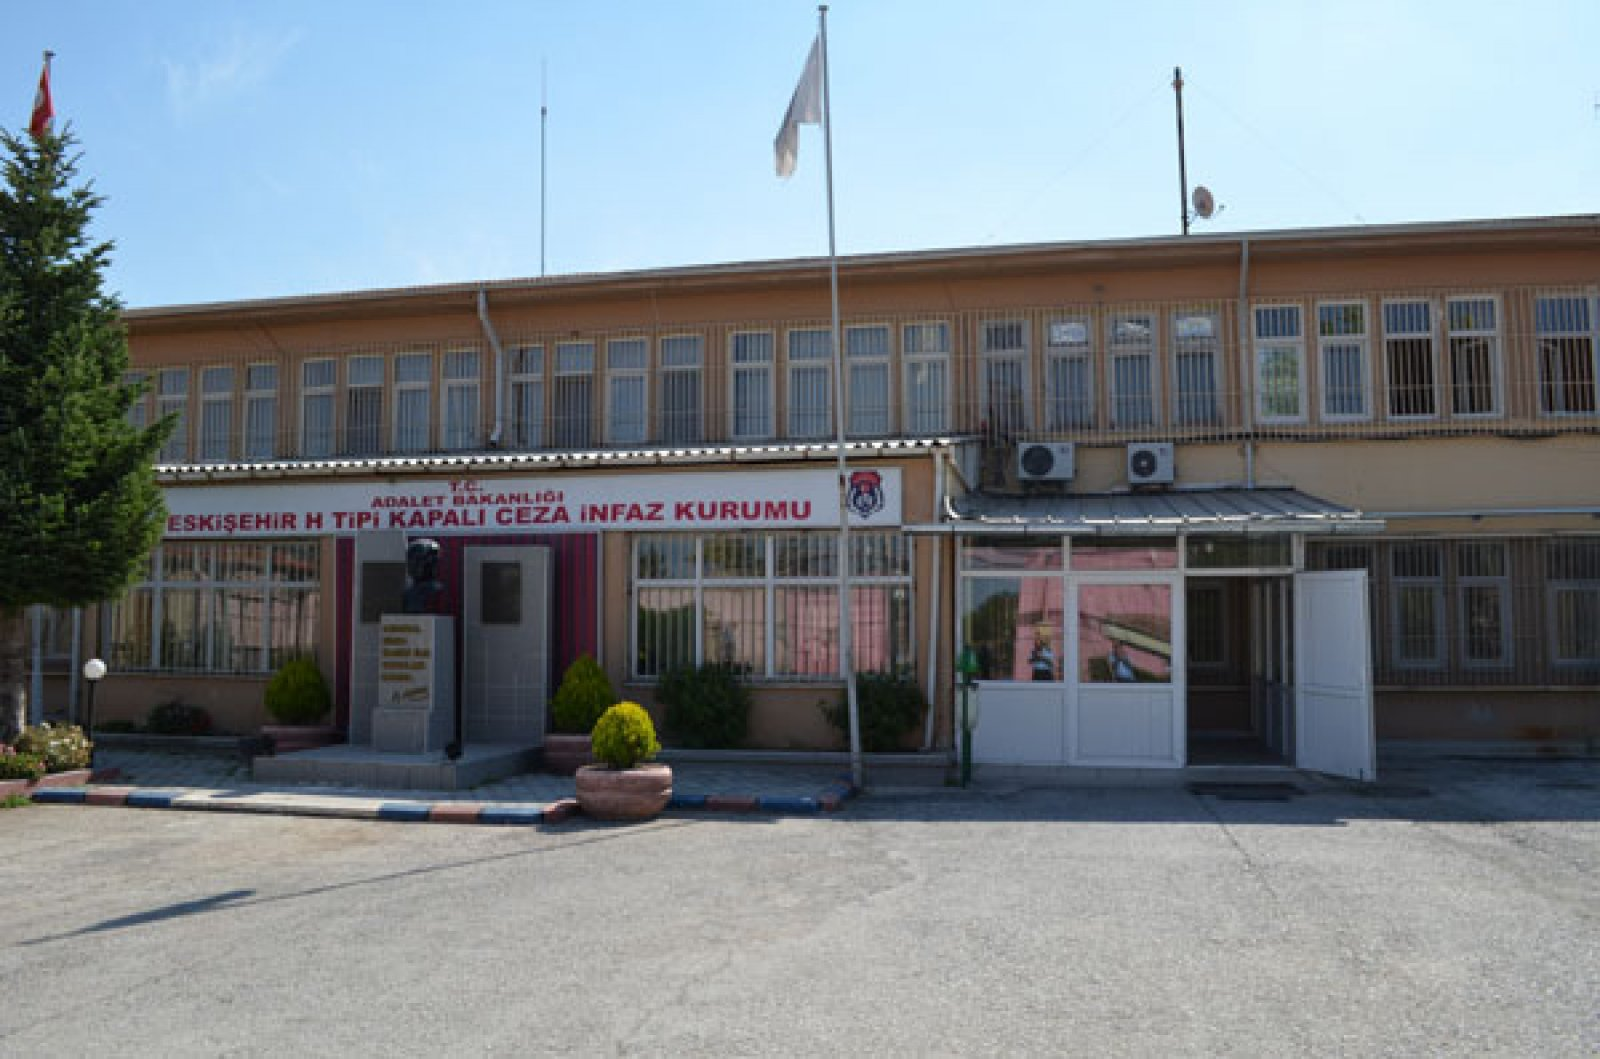 Eskişehir Cezaevi